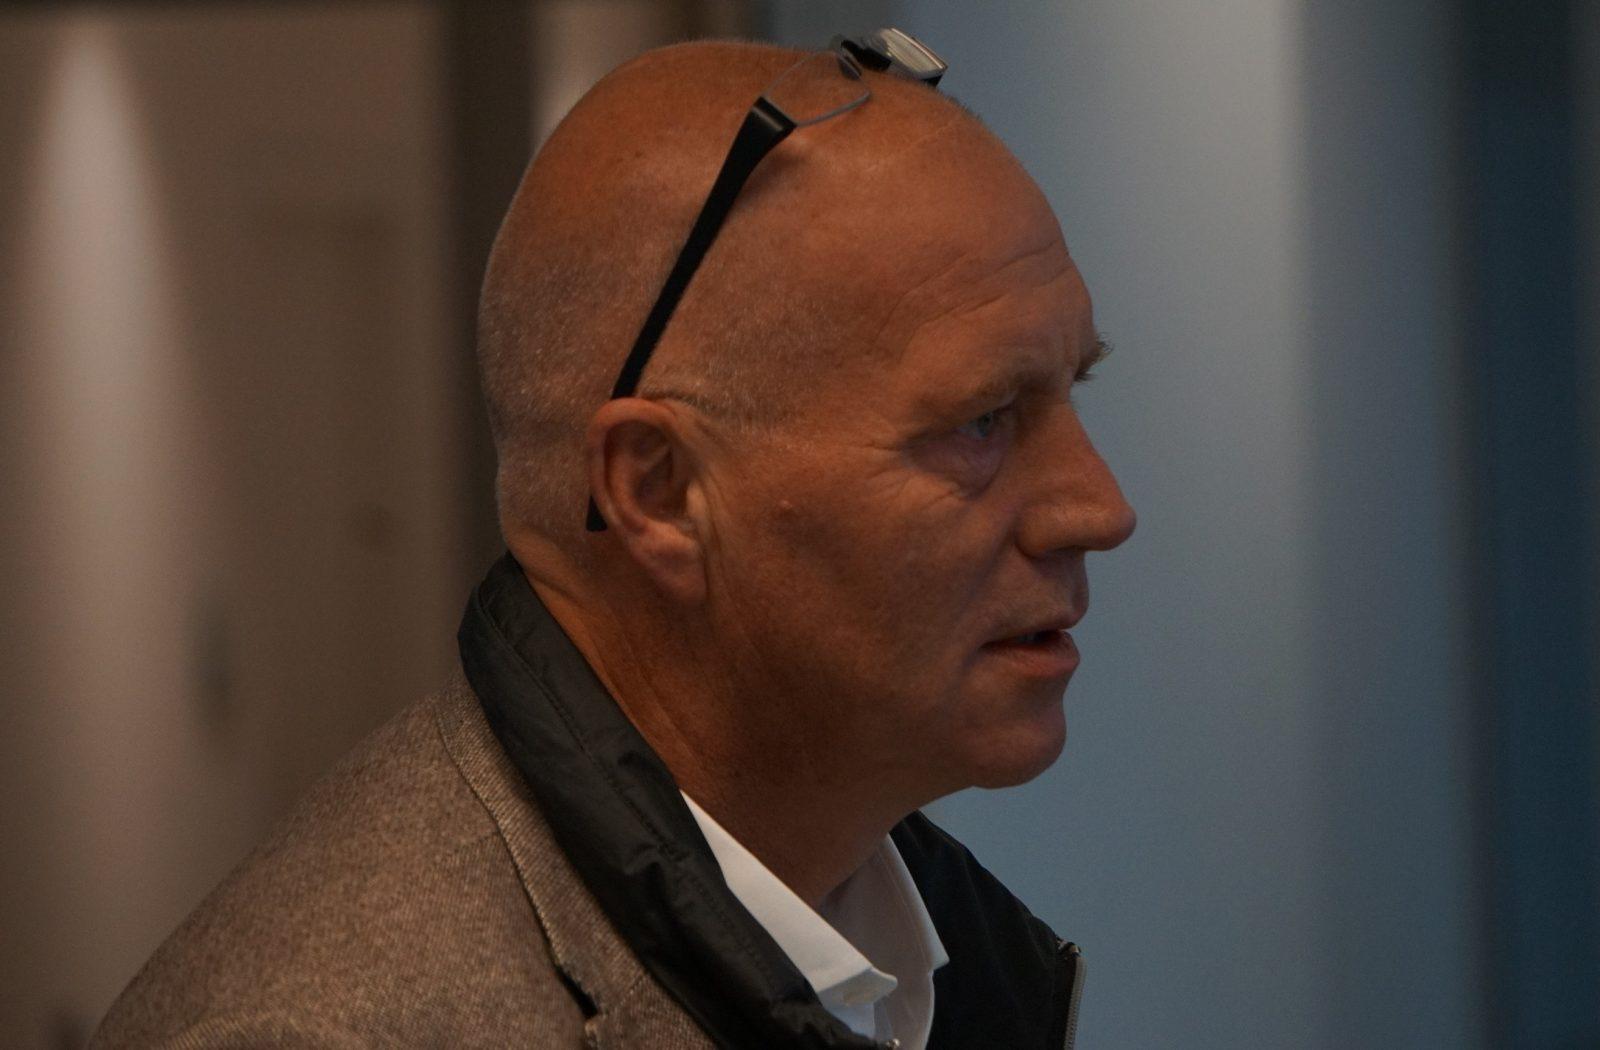 Interview with Ralf Bucksch from IBM